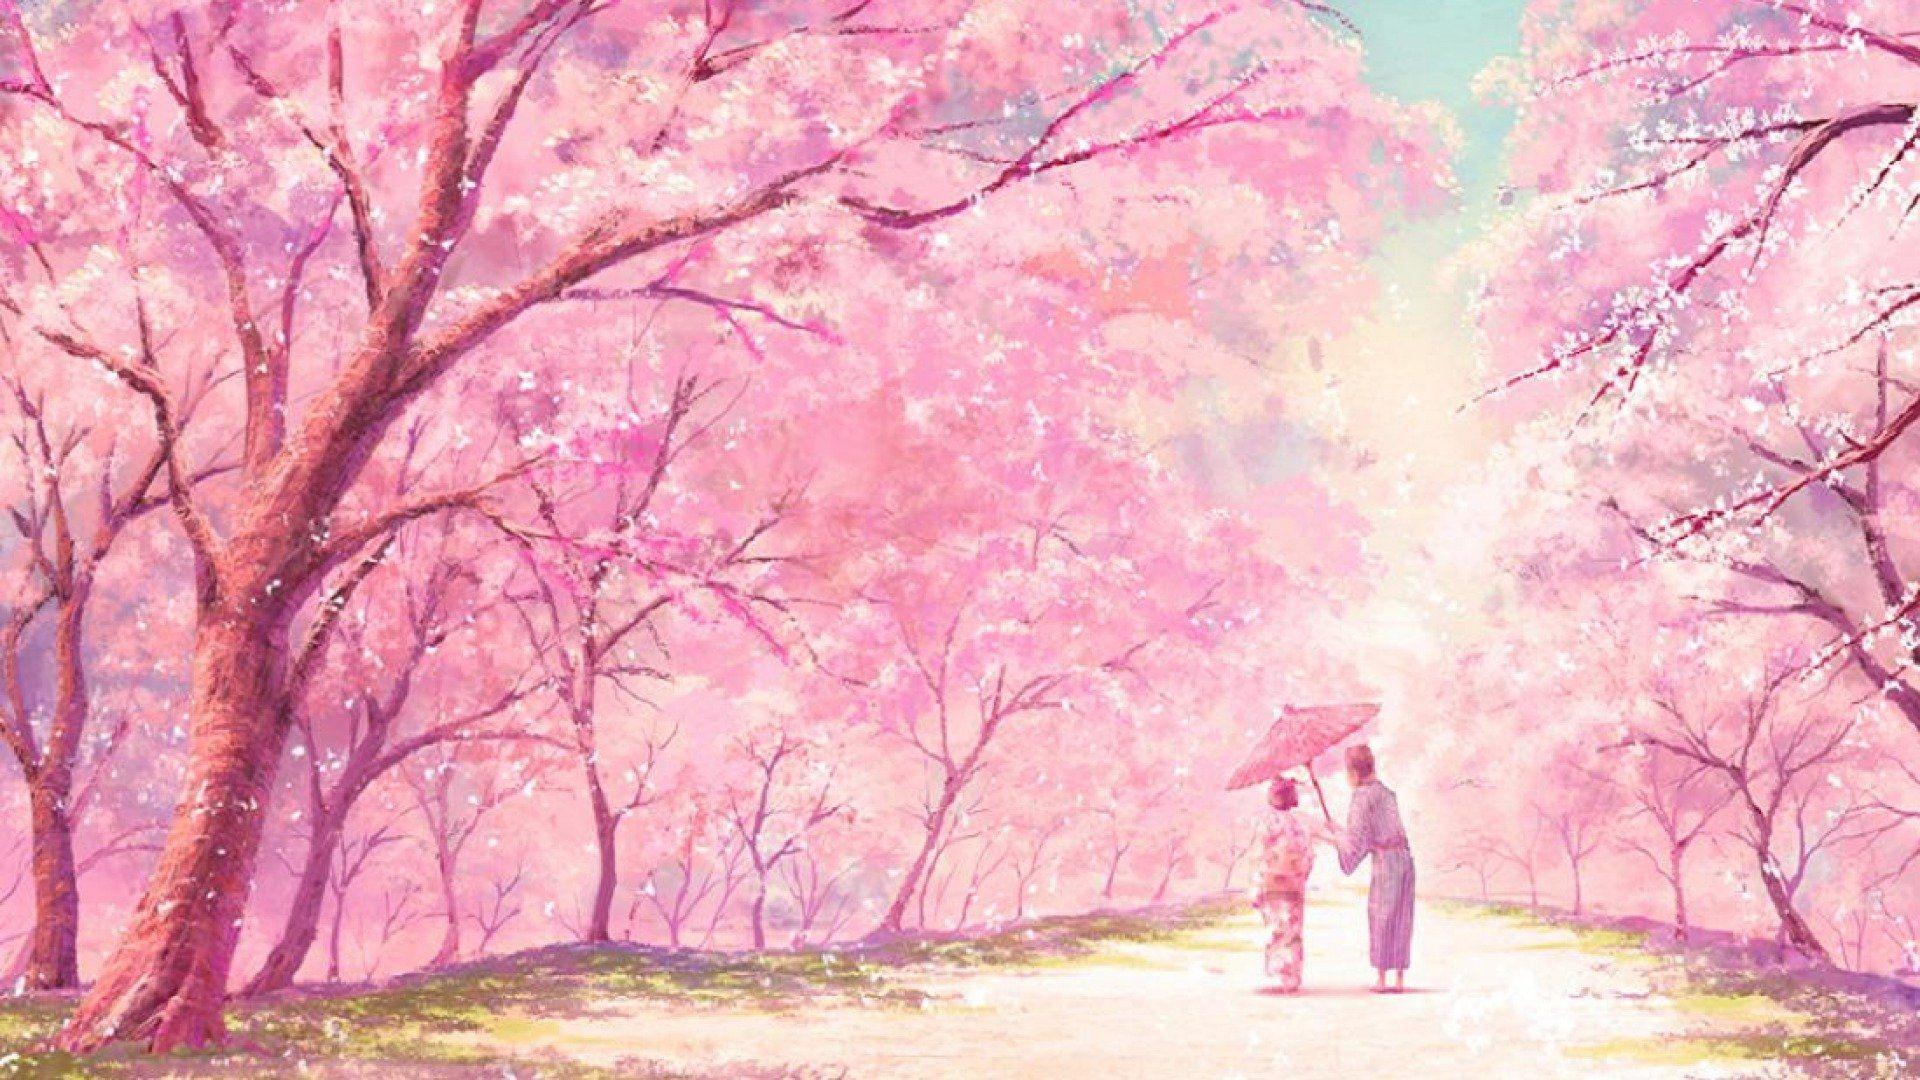 Cute Pink Anime Aesthetic Desktop Wallpapers - Wallpaper Cave